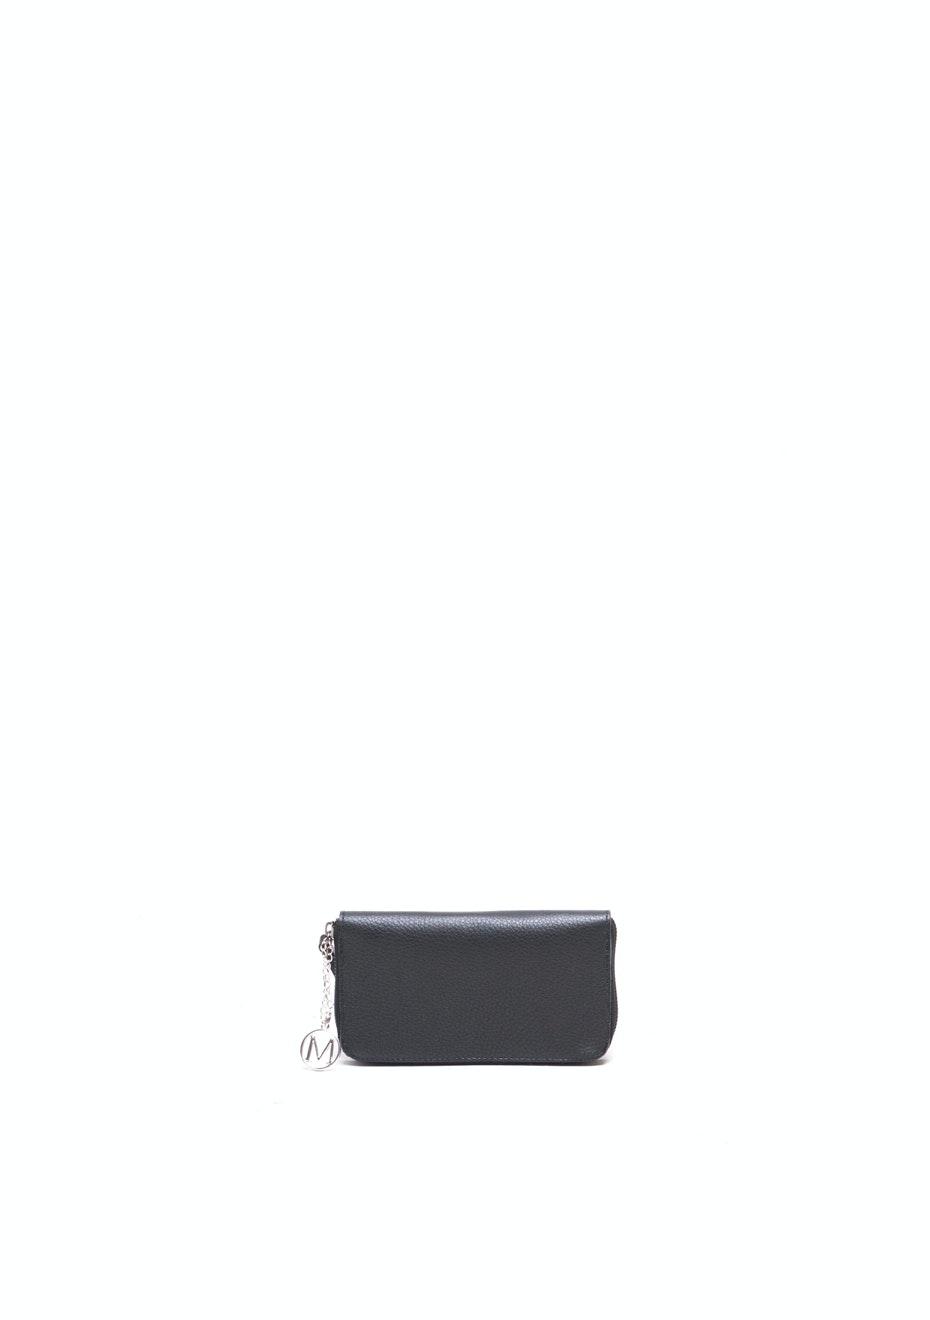 Mangotti - 1138 Wallet - BLACK